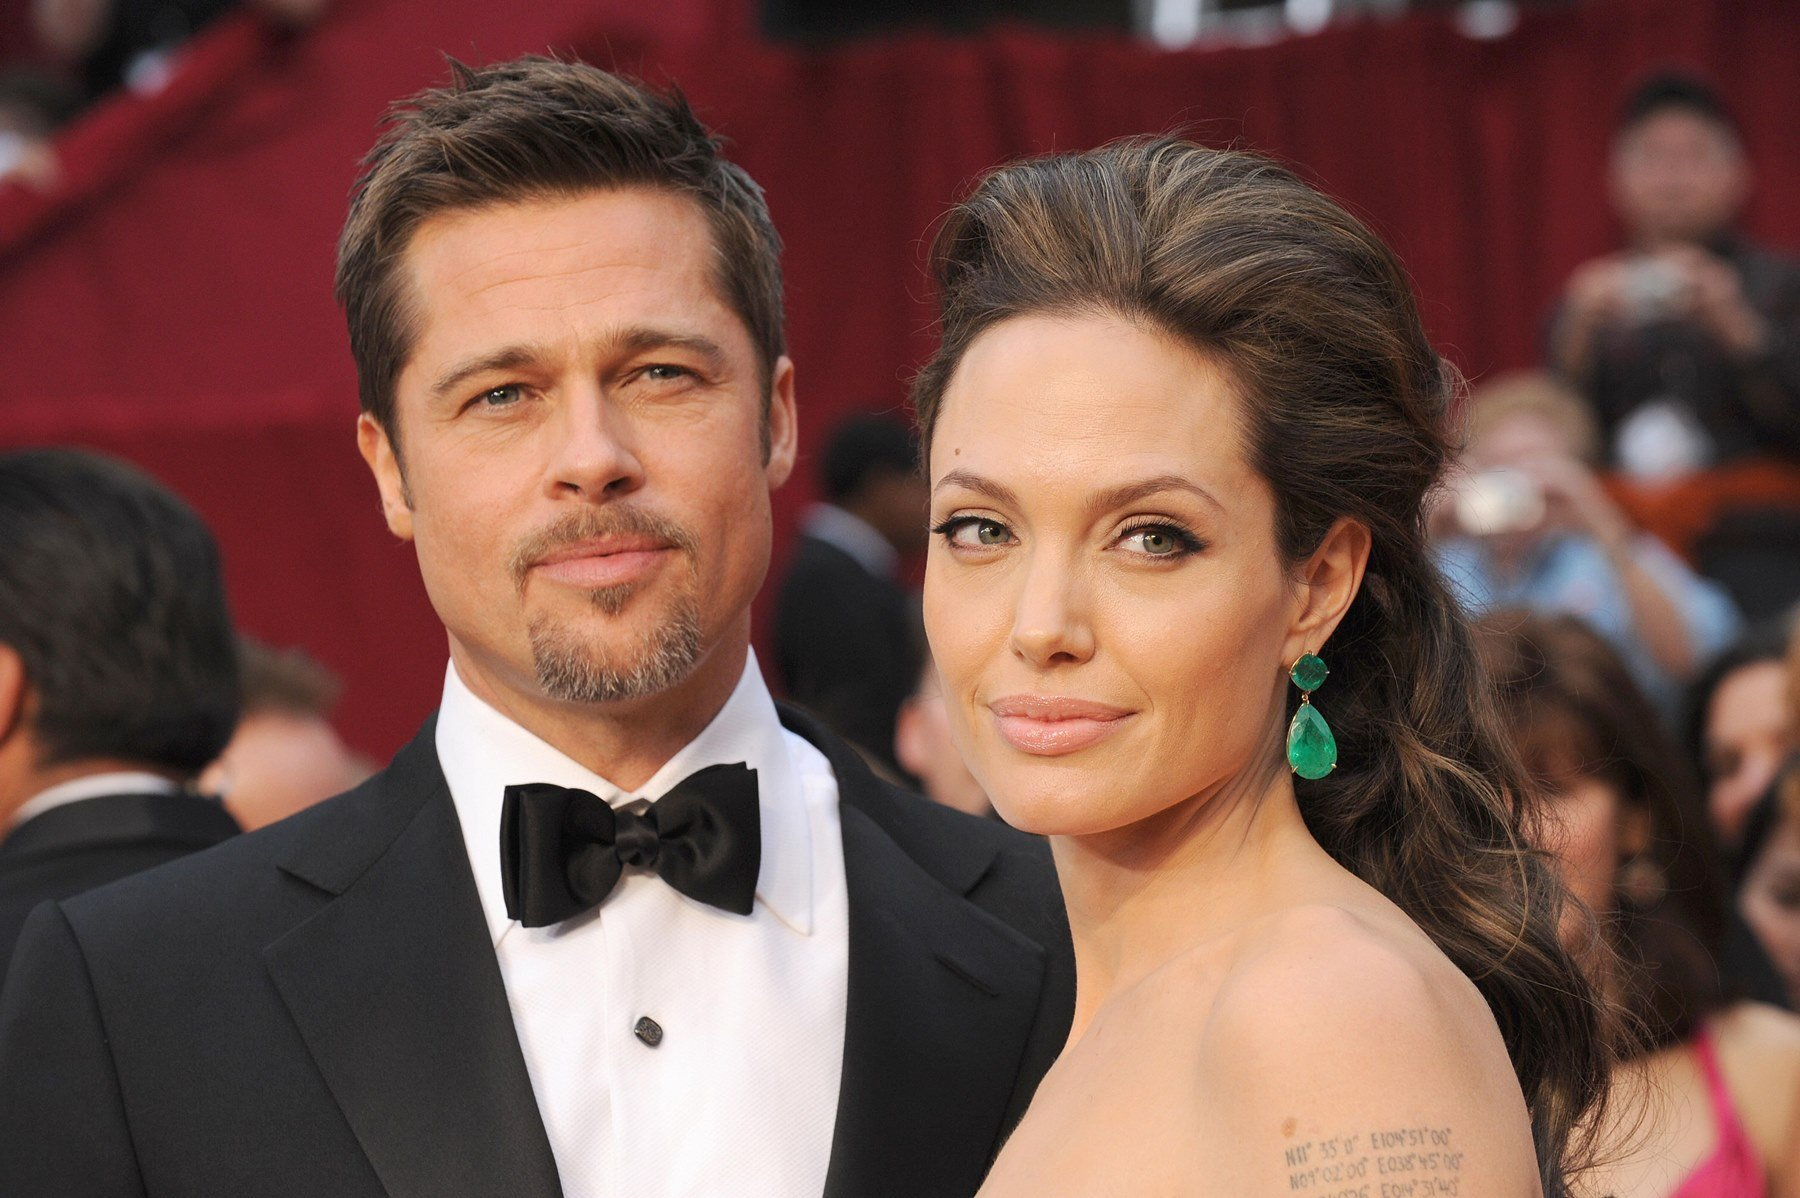 Angelina-Jolie-is-giving-Brad-Pitt-the-wish-of-his